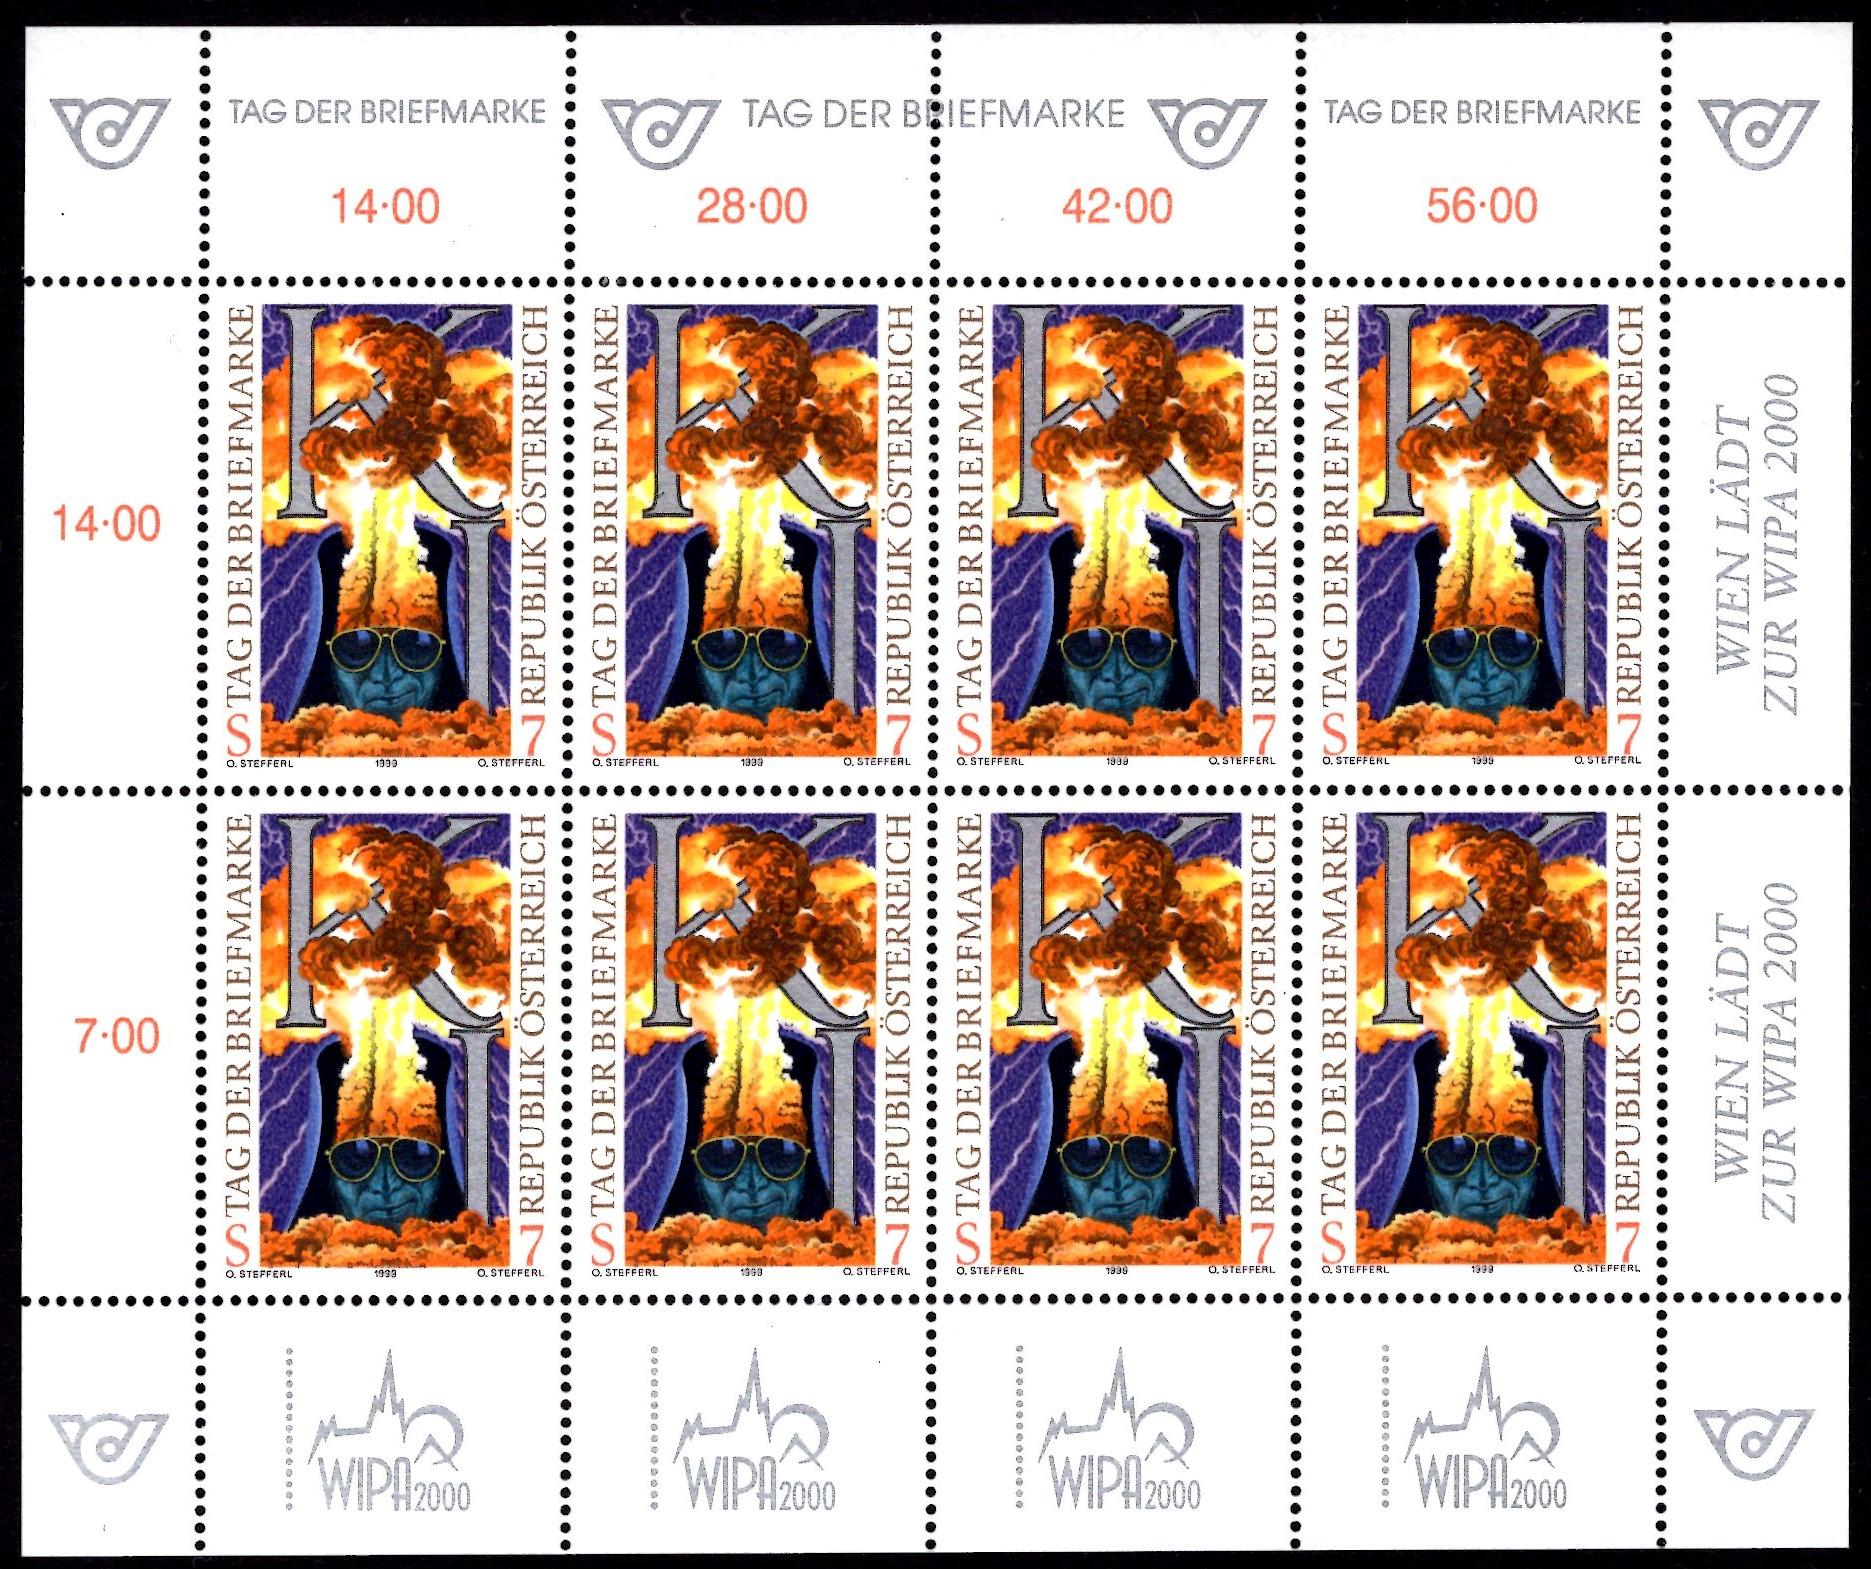 Österr KLBG Tag der Briefmarke 1999 Michel-Nr 2289